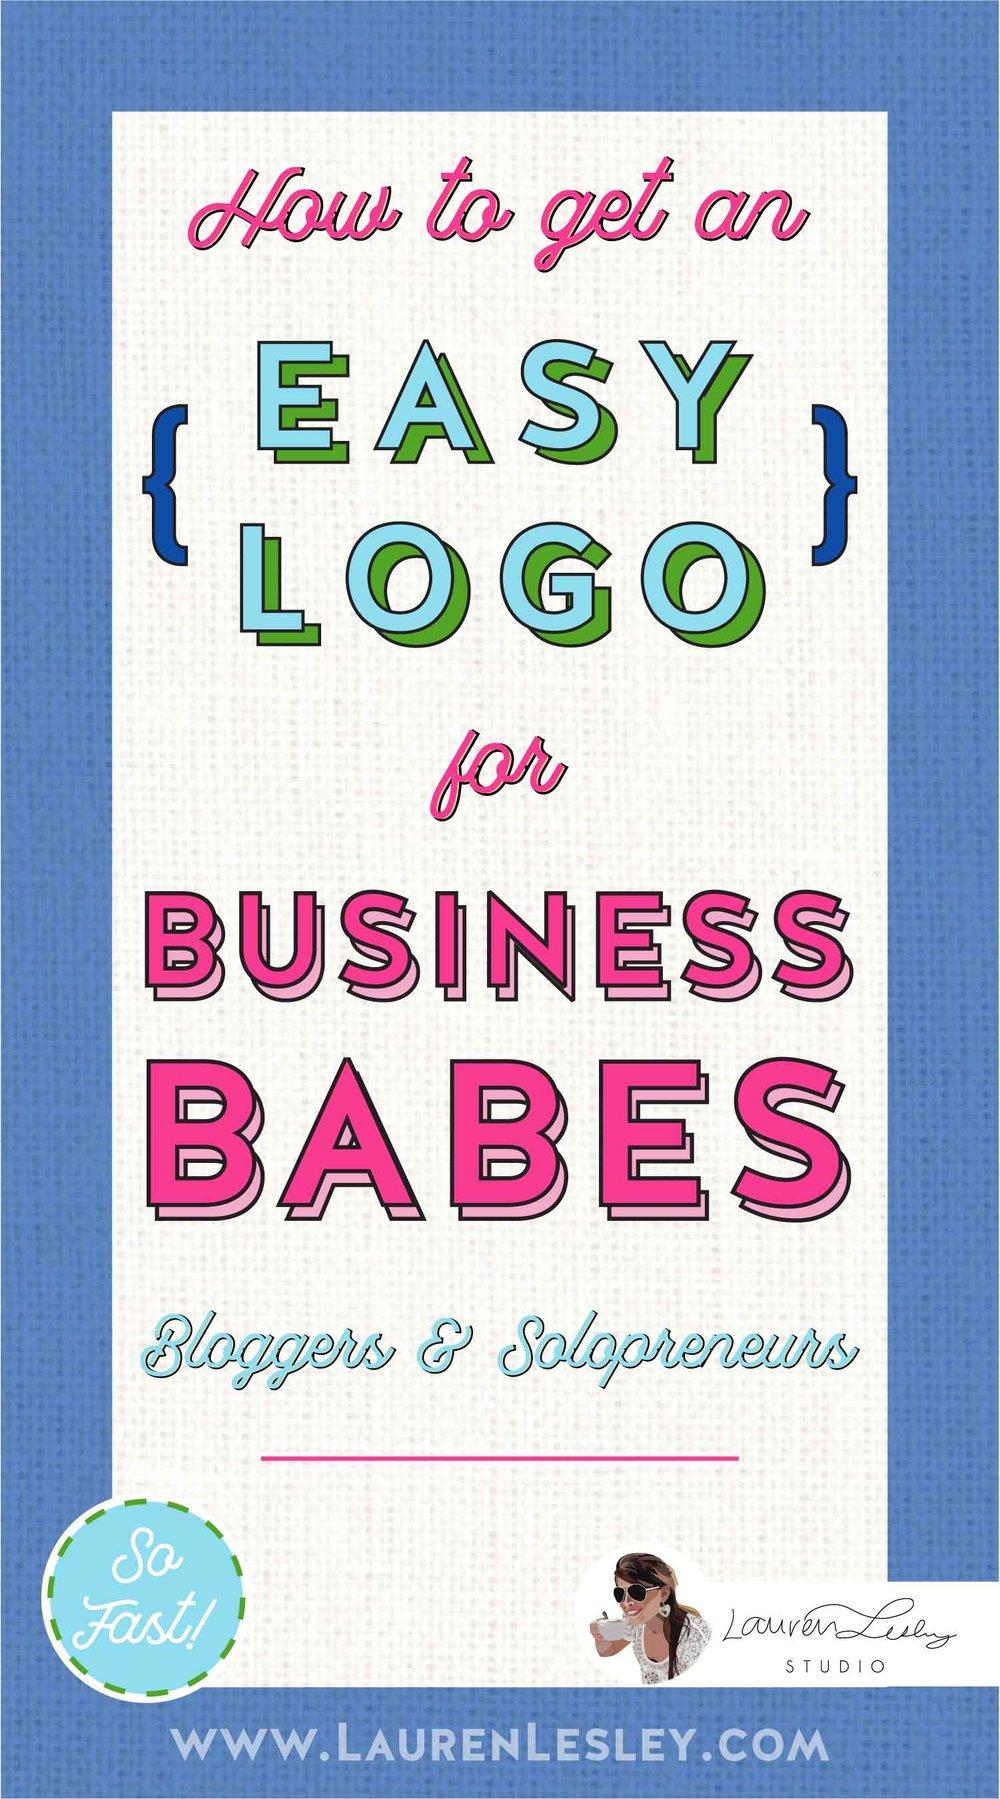 Hair Stylist Logo Entrepreneur Solopreneur Logo Business Babes